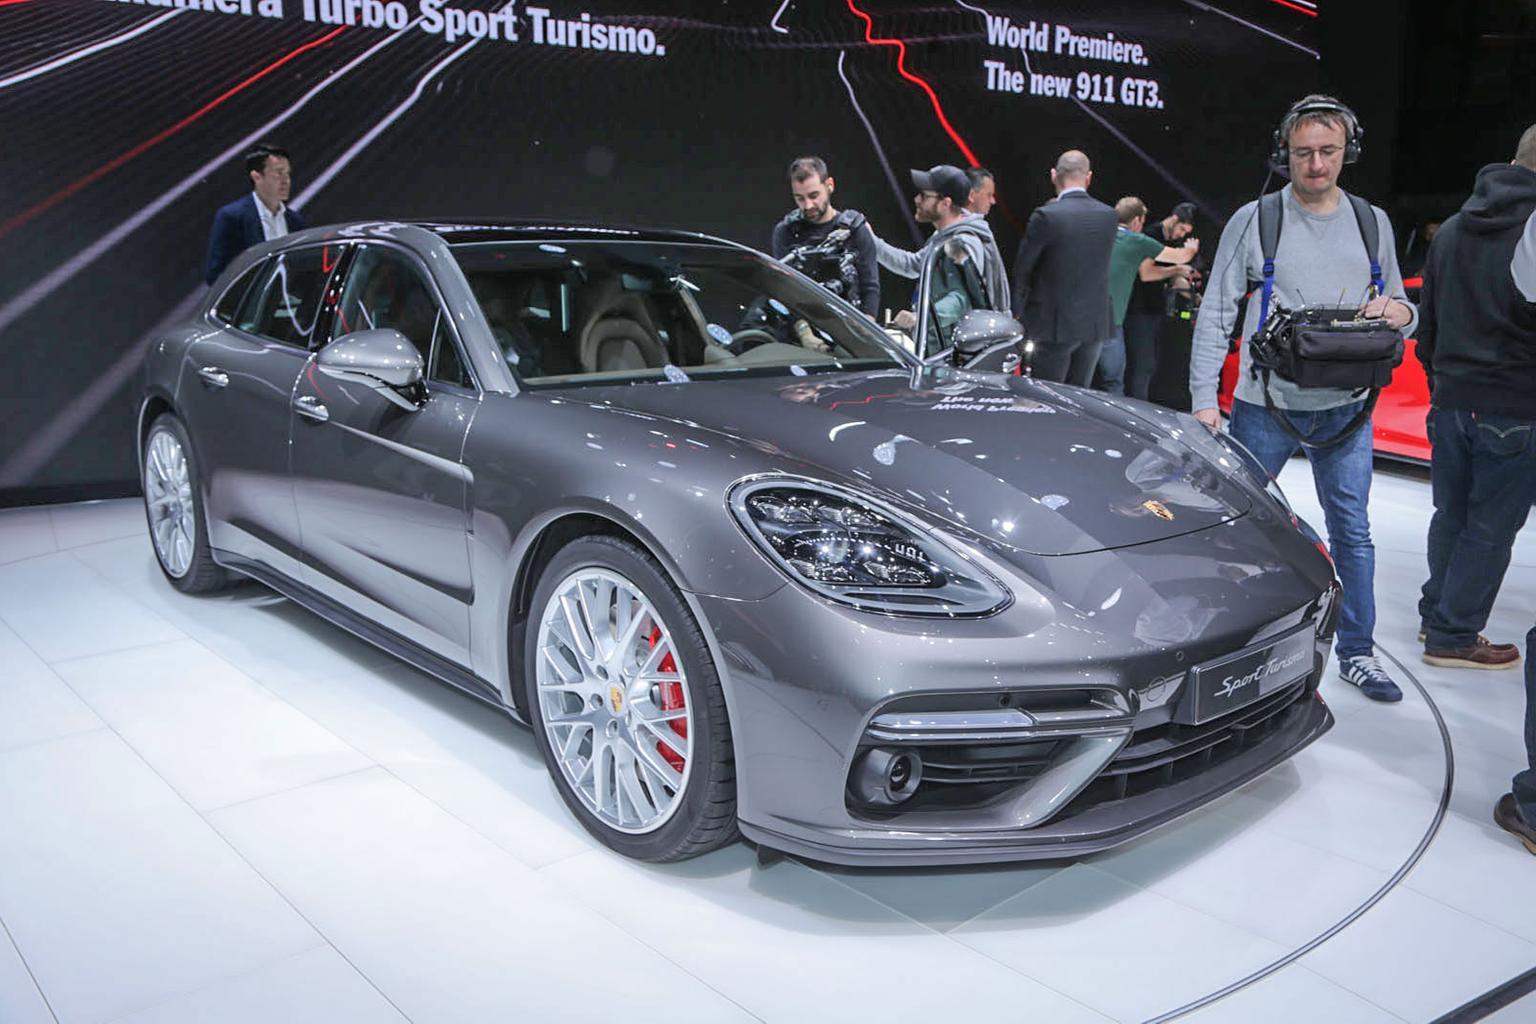 Geneva motor show 2017 - our star cars